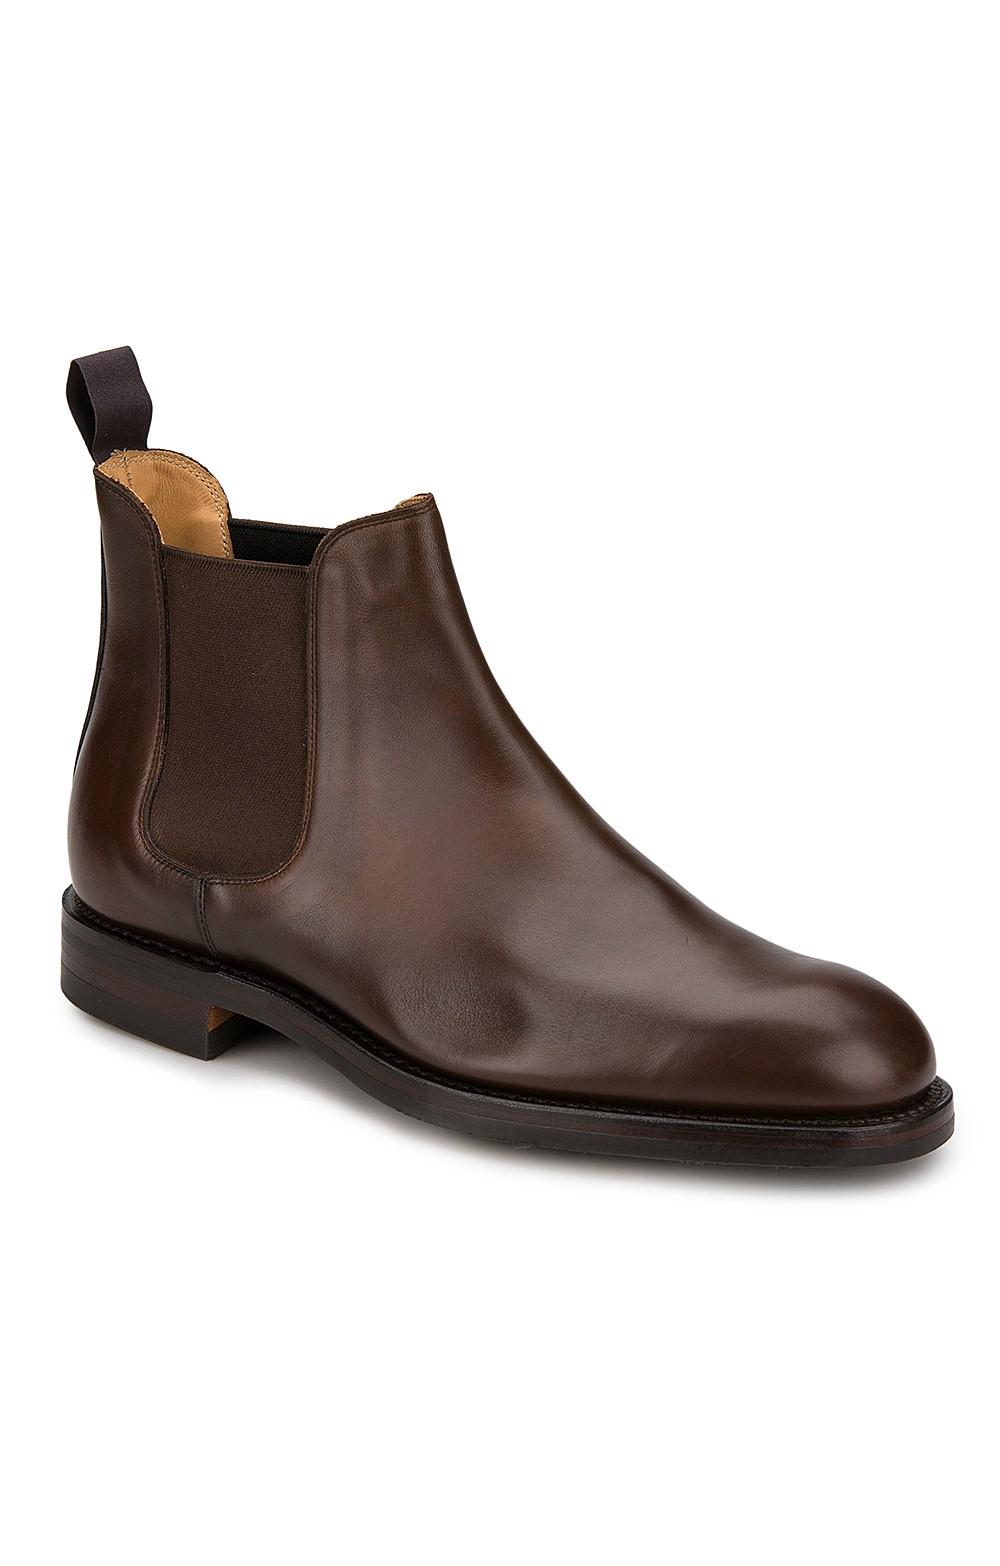 4f92caa936b Mens Crockett And Jones Leather Chelsea Boot